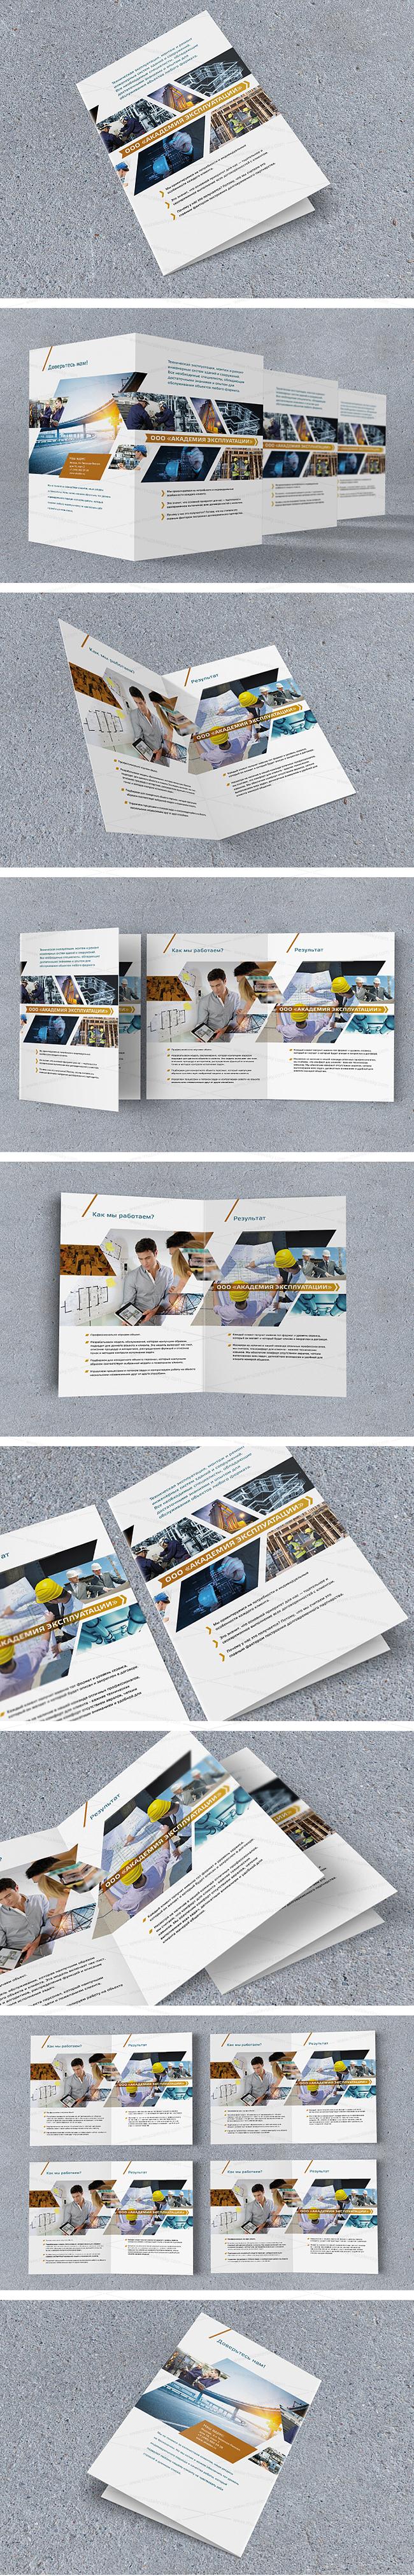 Booklet-Expluatation_my